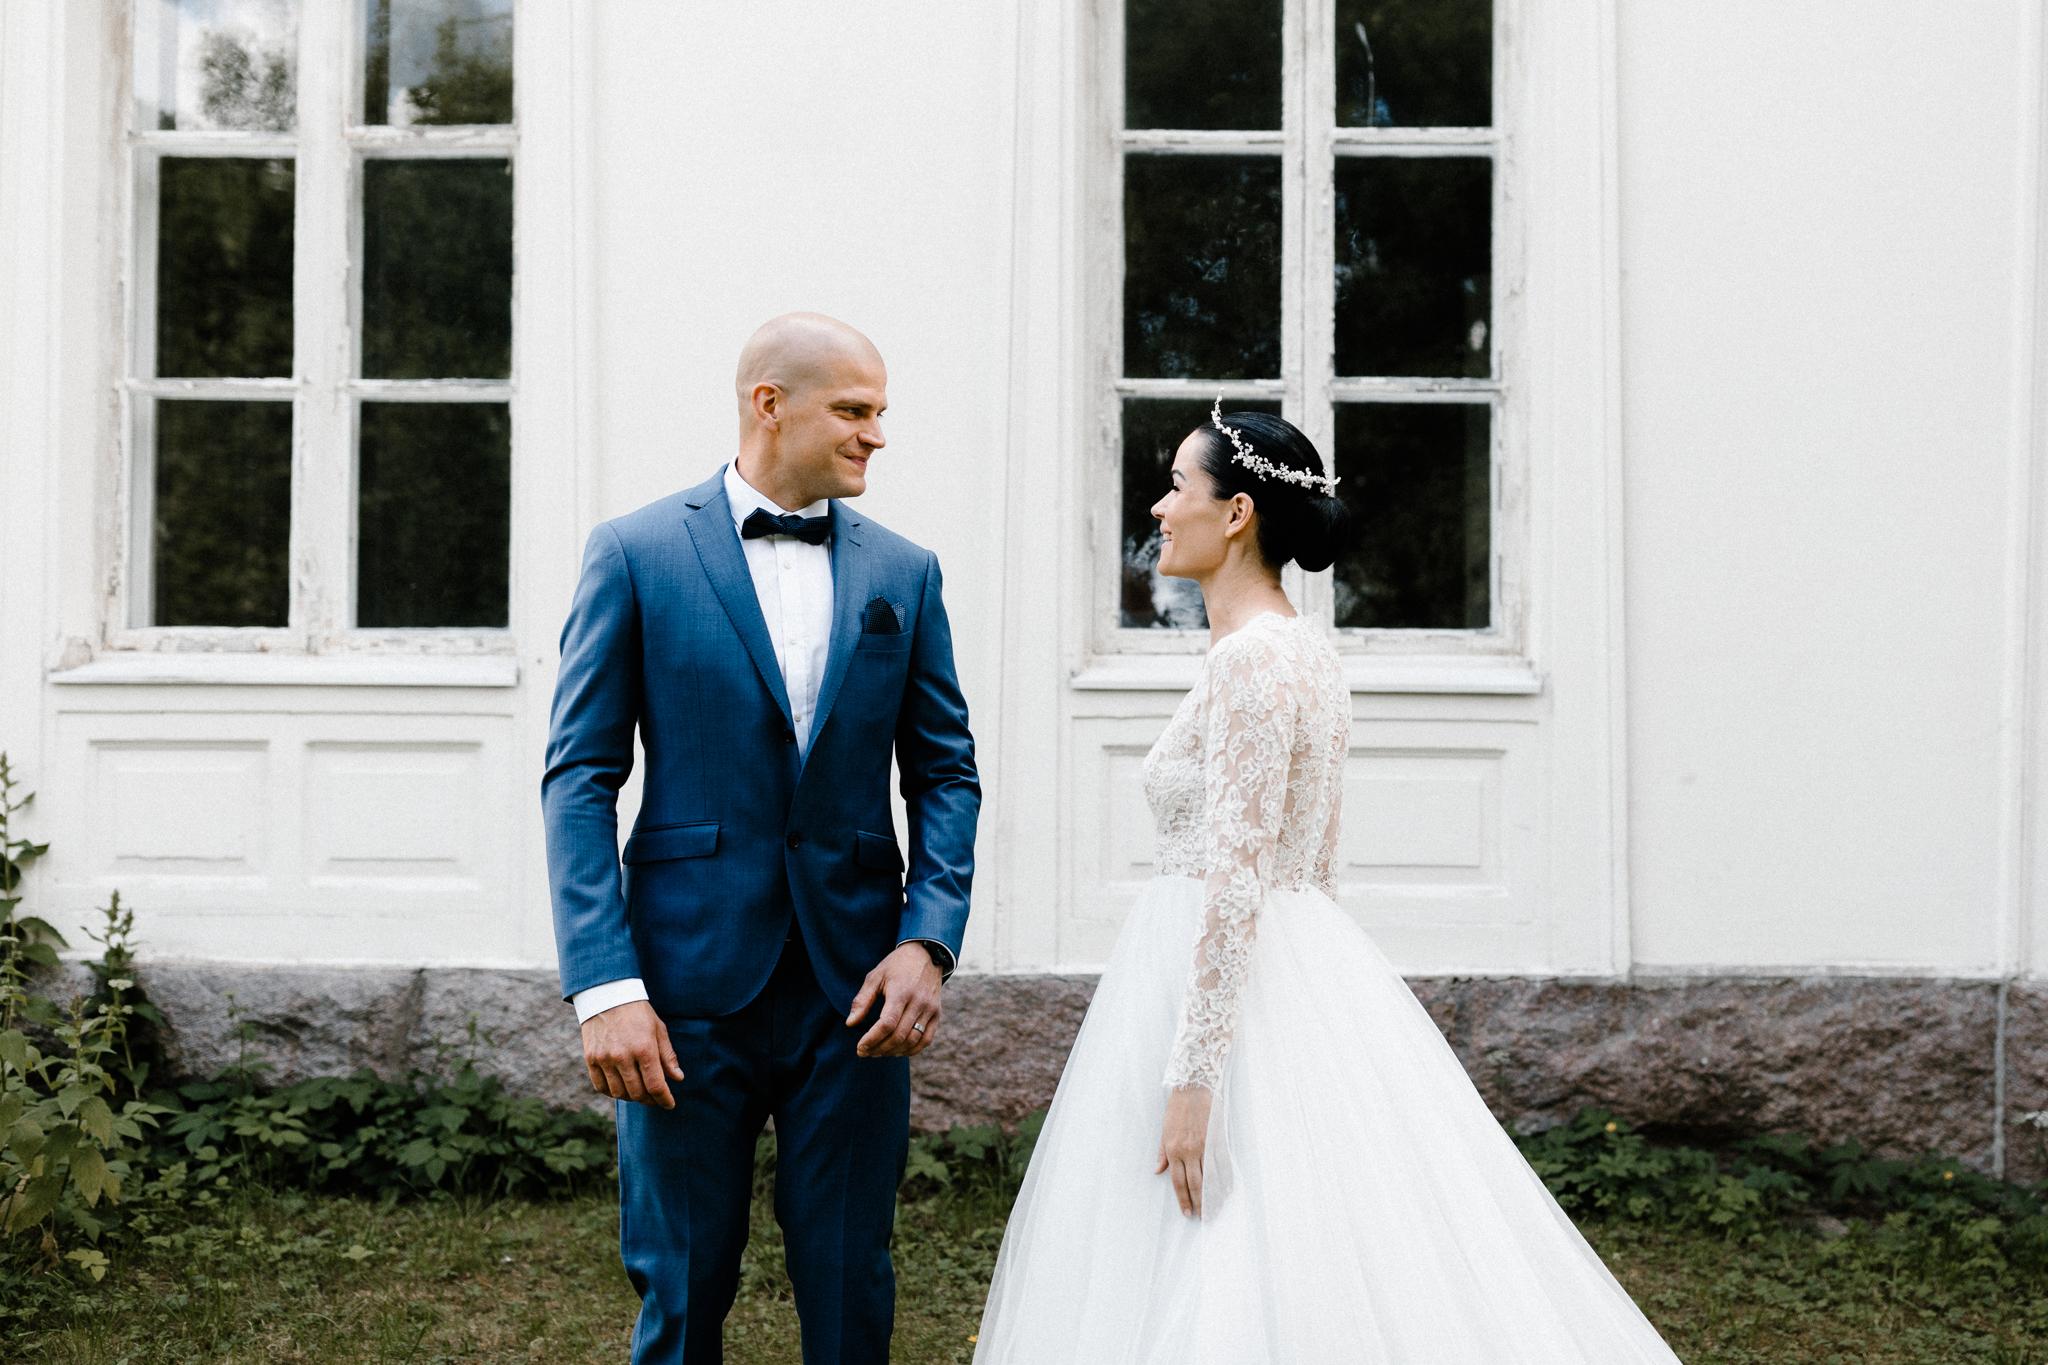 Essi + Ville   Oitbacka Gården   by Patrick Karkkolainen Wedding Photography-45.jpg